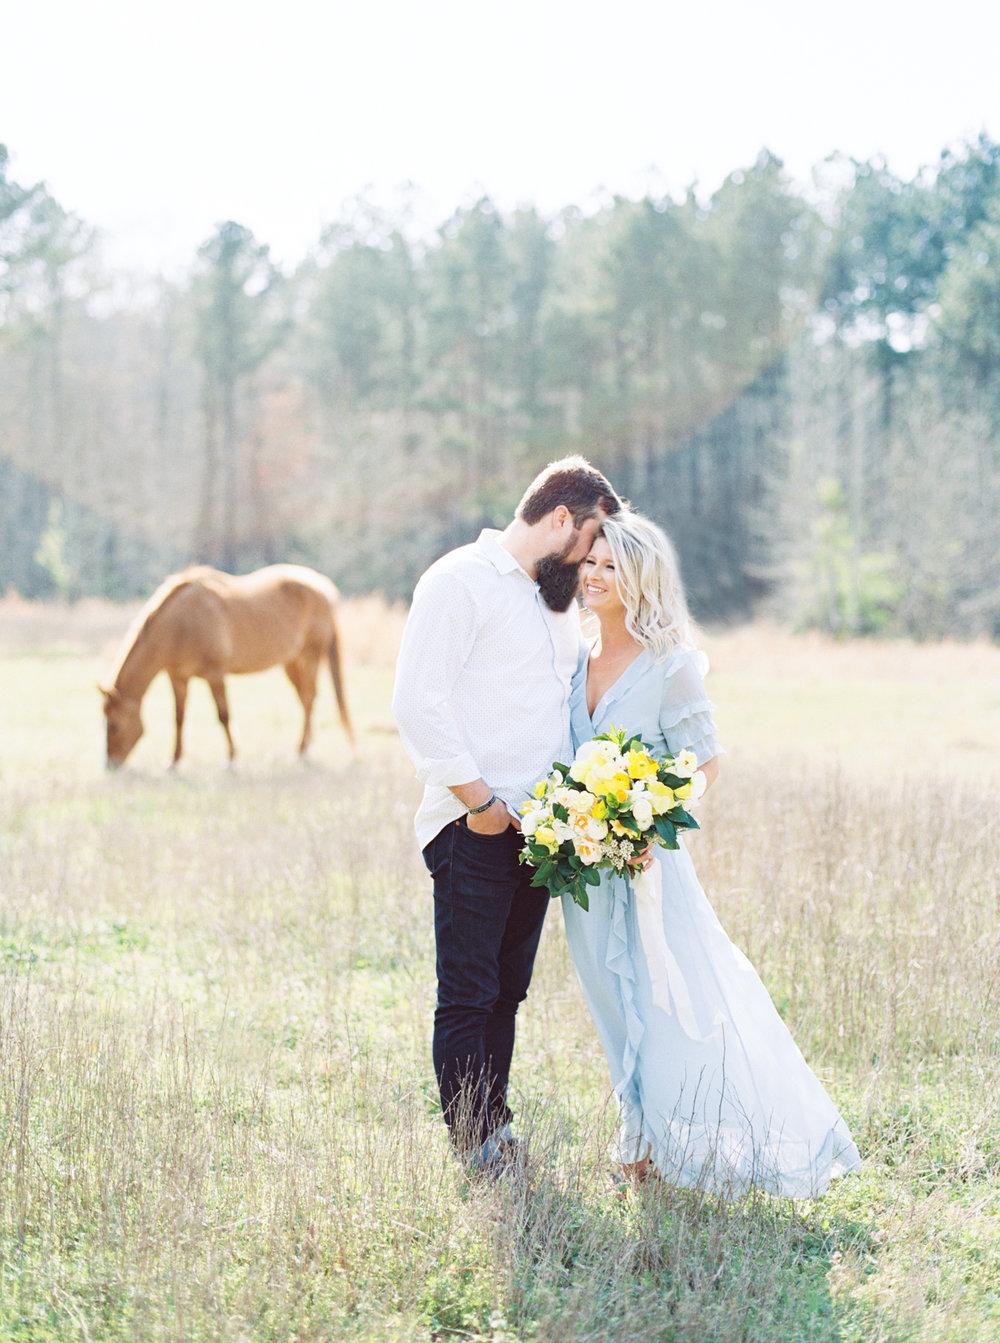 hannah forsberg atlanta wedding photographer whitney spence anniversary session with miniature donkeys and horse-1.jpg